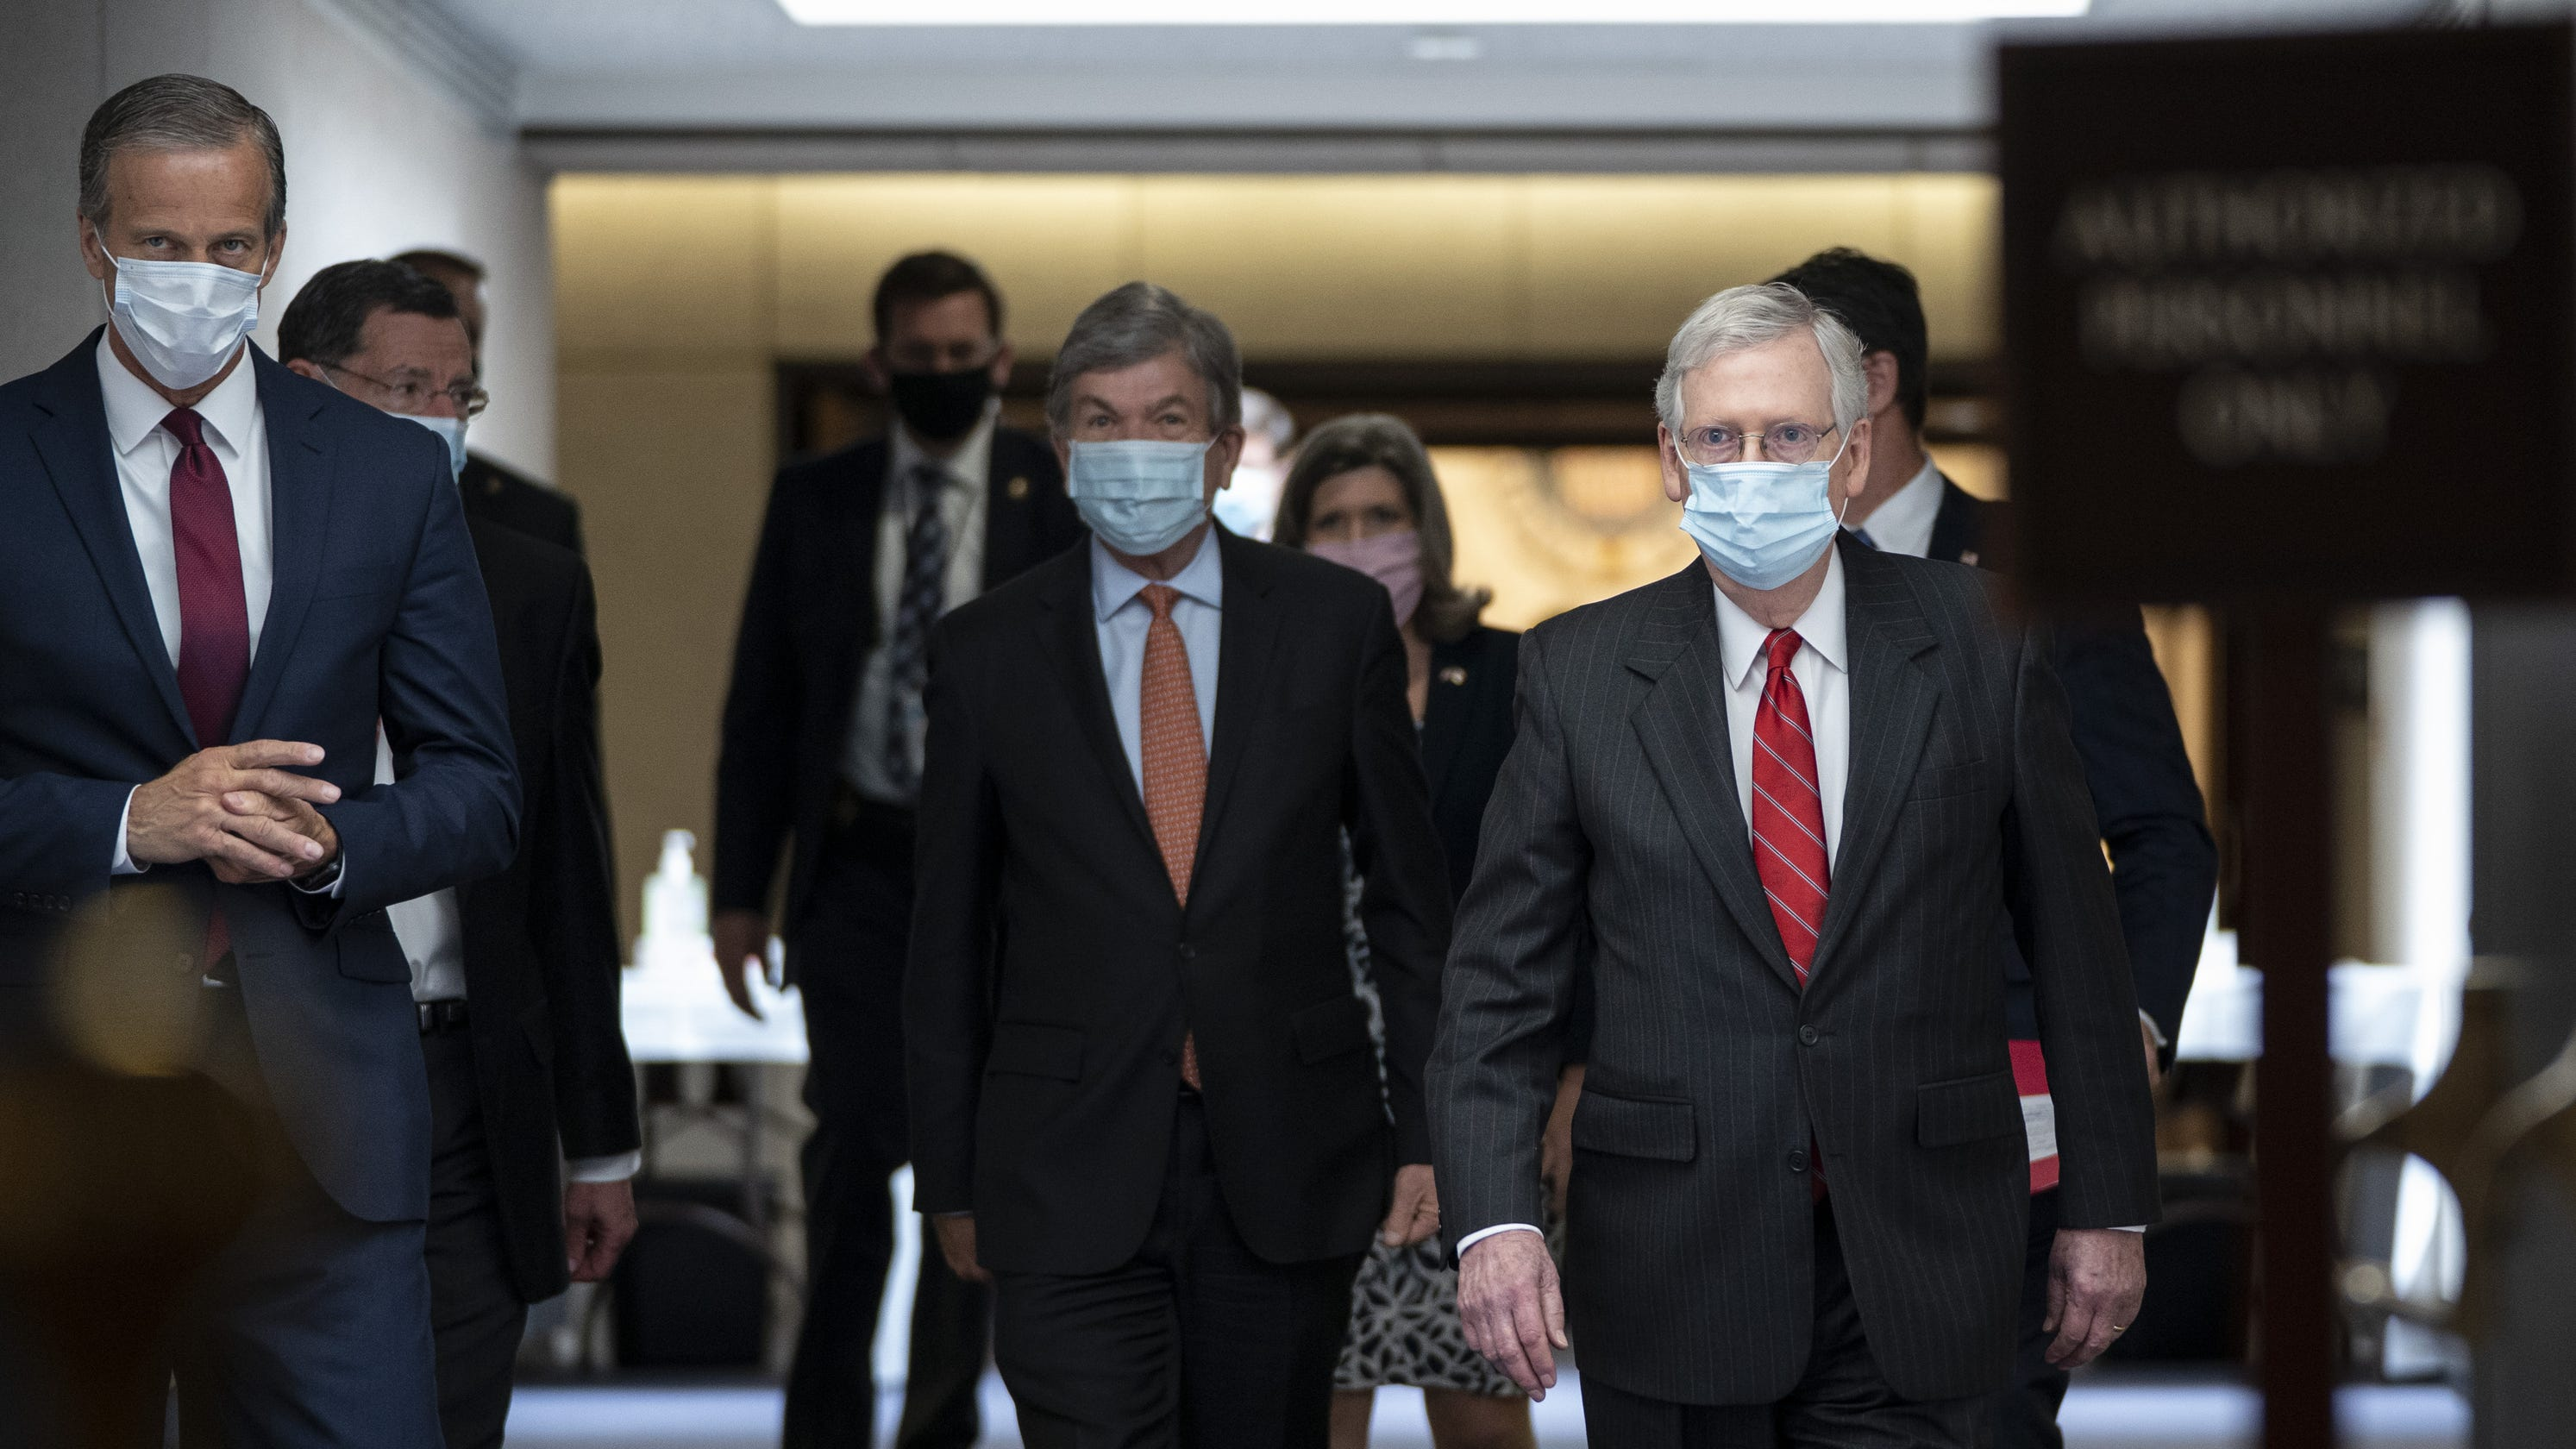 Trump, Congress split on stimulus to address COVID-19